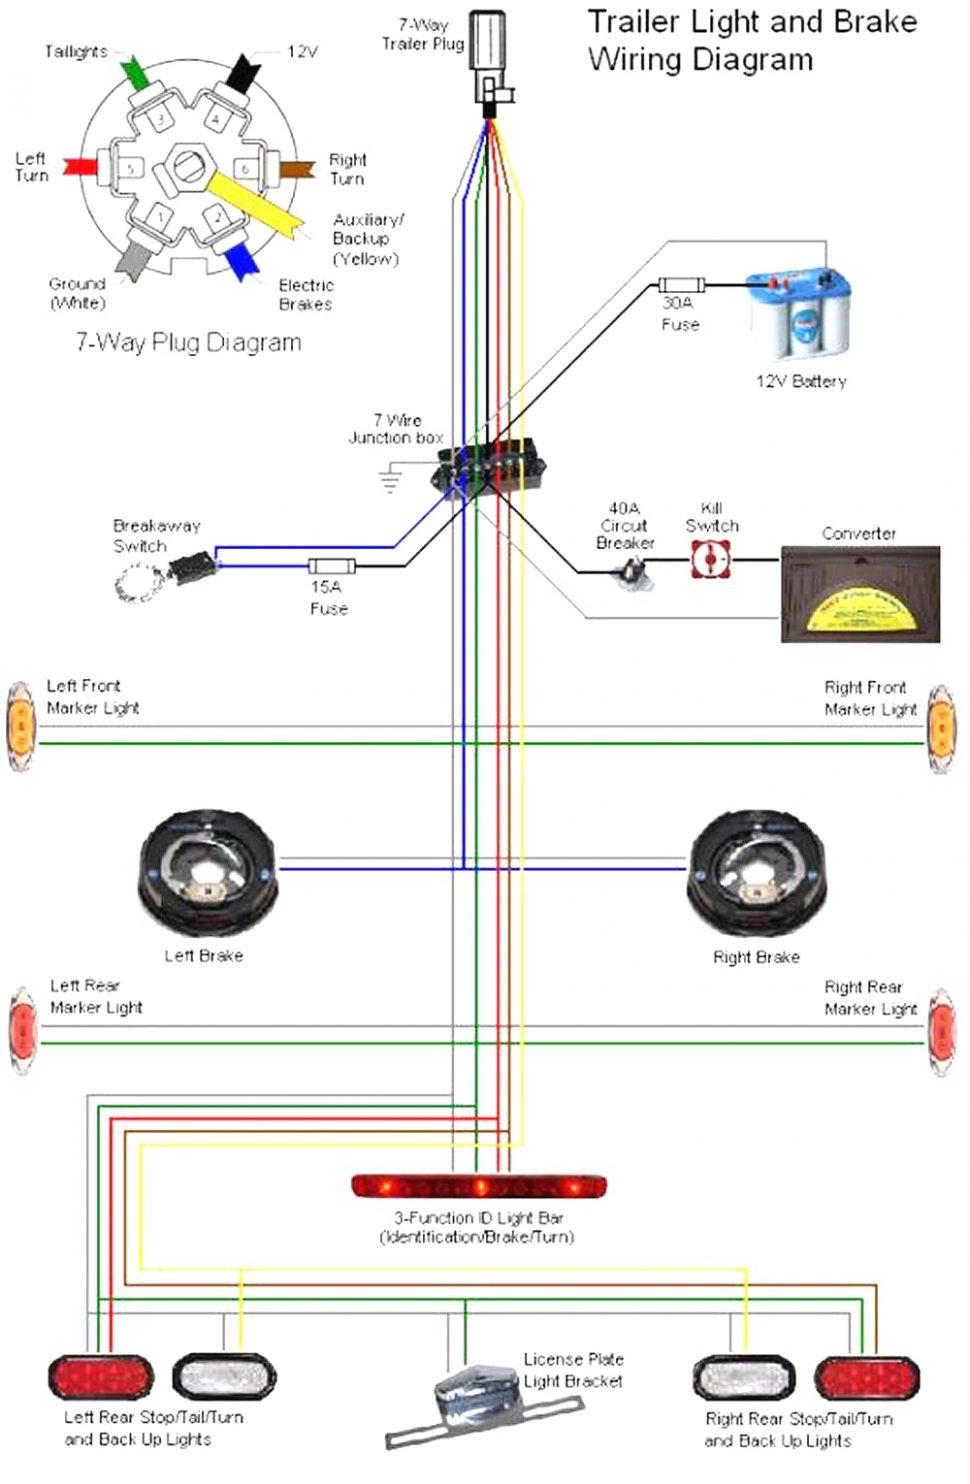 Semi Trailer Tail Light Wiring Diagram 2012 Chevy Express Fuse Box Pontiacs Citroen Wirings1 Jeanjaures37 Fr